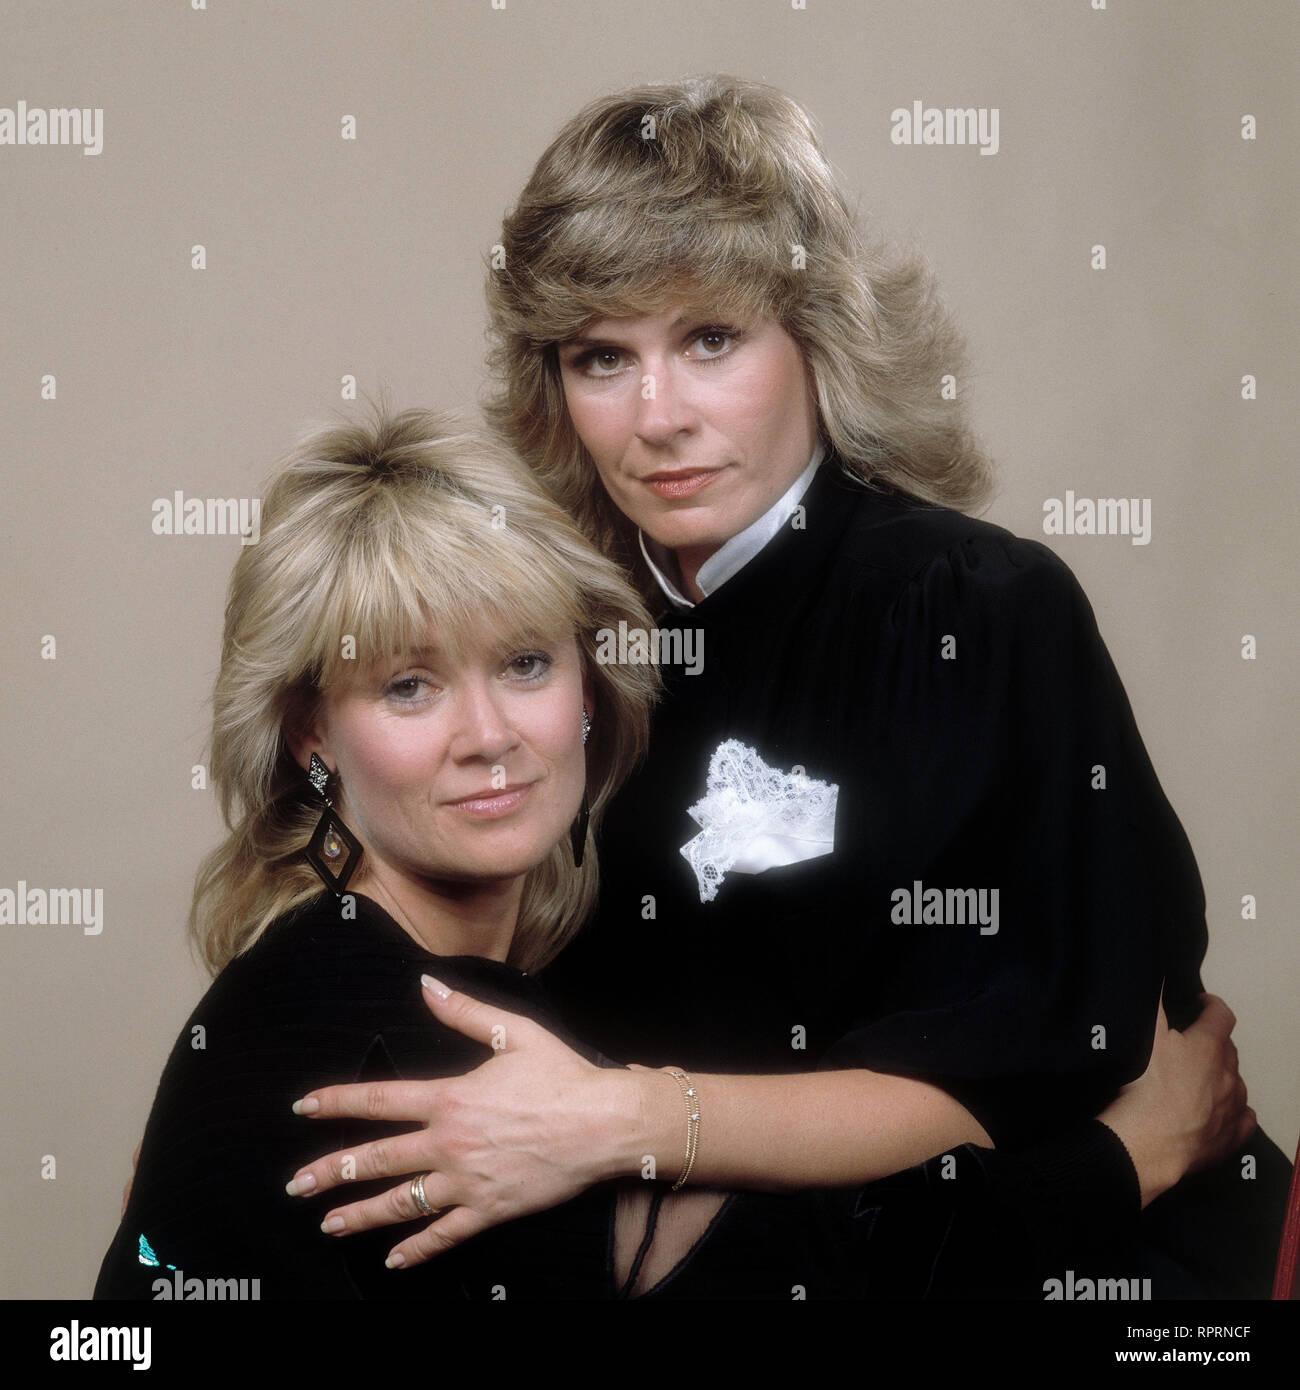 GITTE und MARY ROOS, August 1980. Studioaufnahme. kpa/Grimm Stock Photo